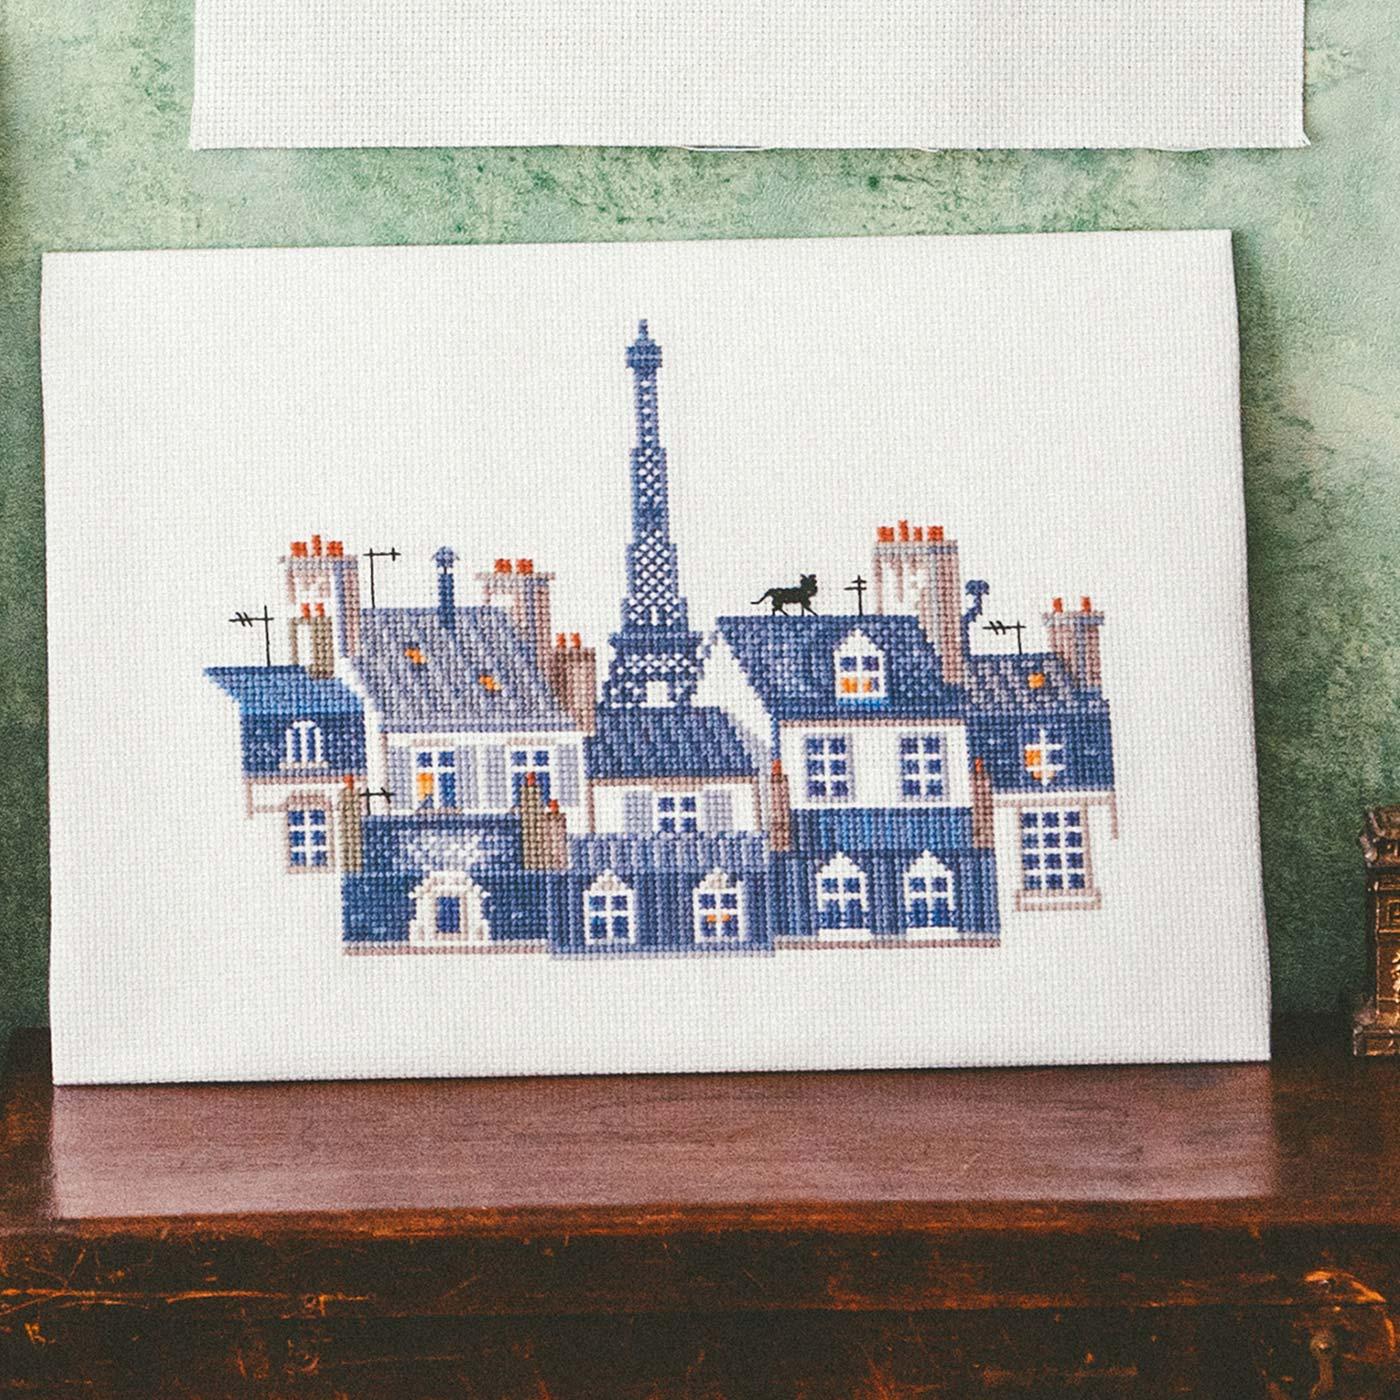 Les toits de Paris:パリの屋根